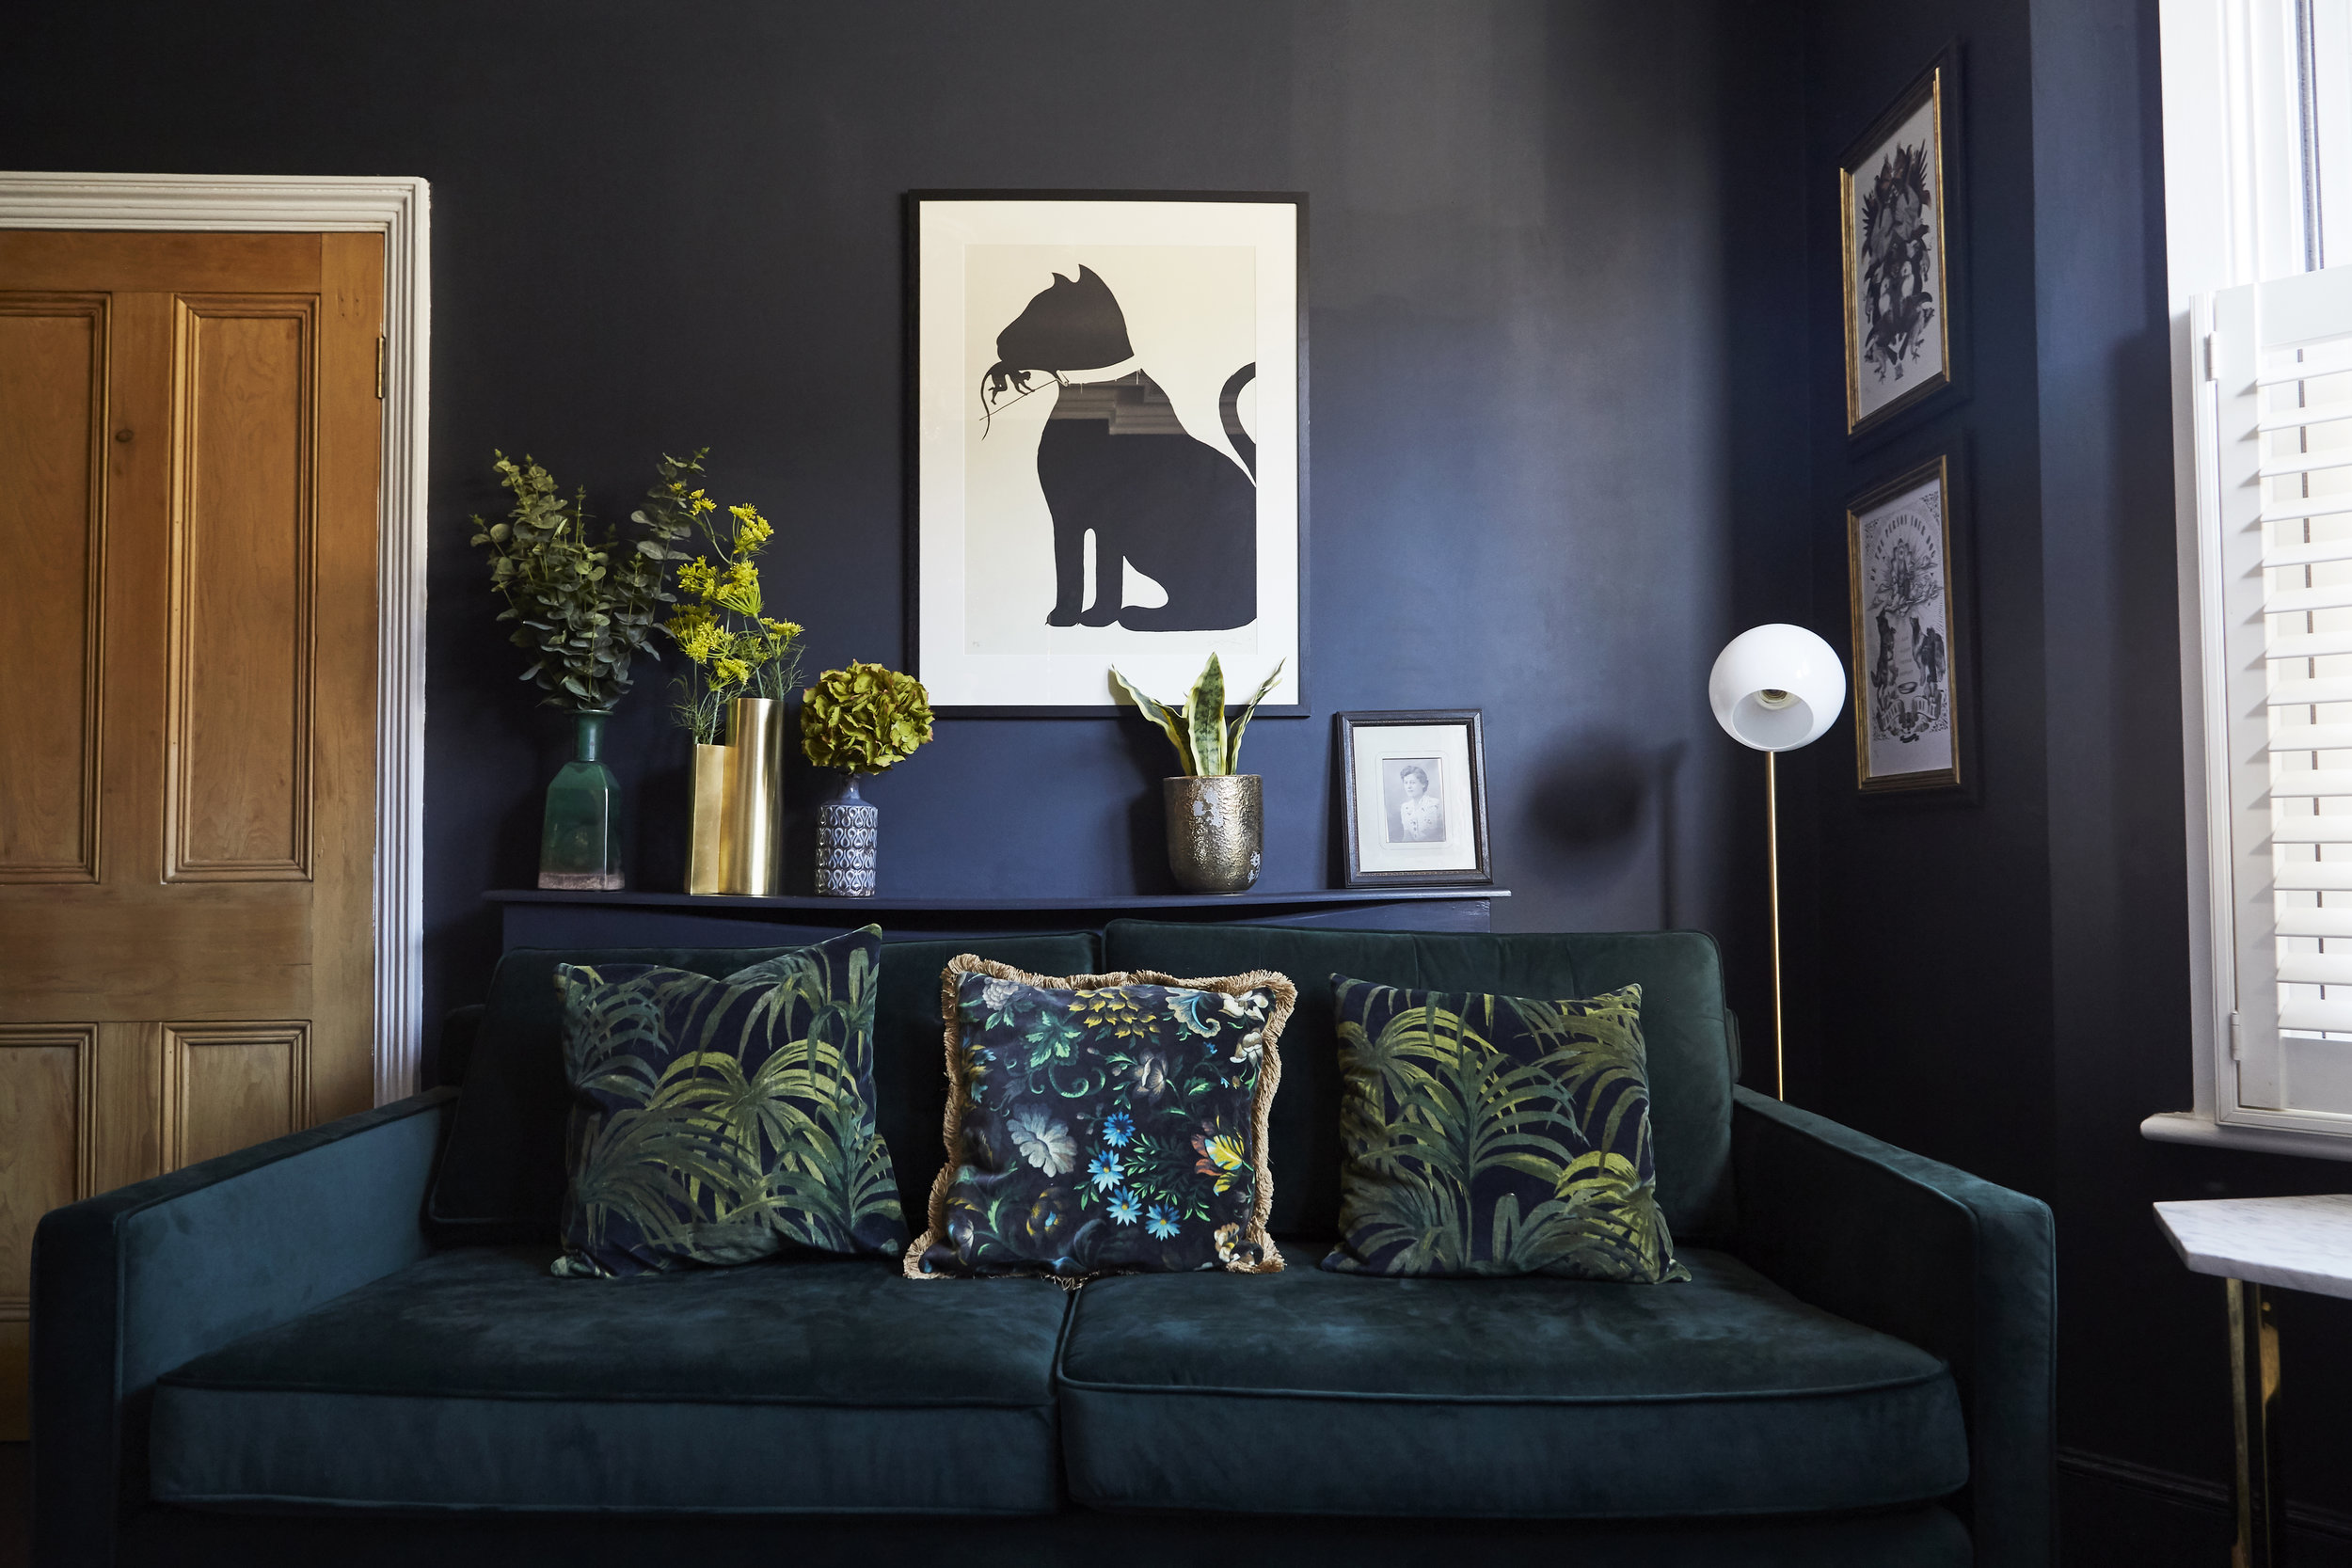 Drake Green velvet sofa   £999,   West Elm    ;    Staggered glass floor lamp    £199,    West Elm   ;  Cushions hand made in   House of hackney   fabric.